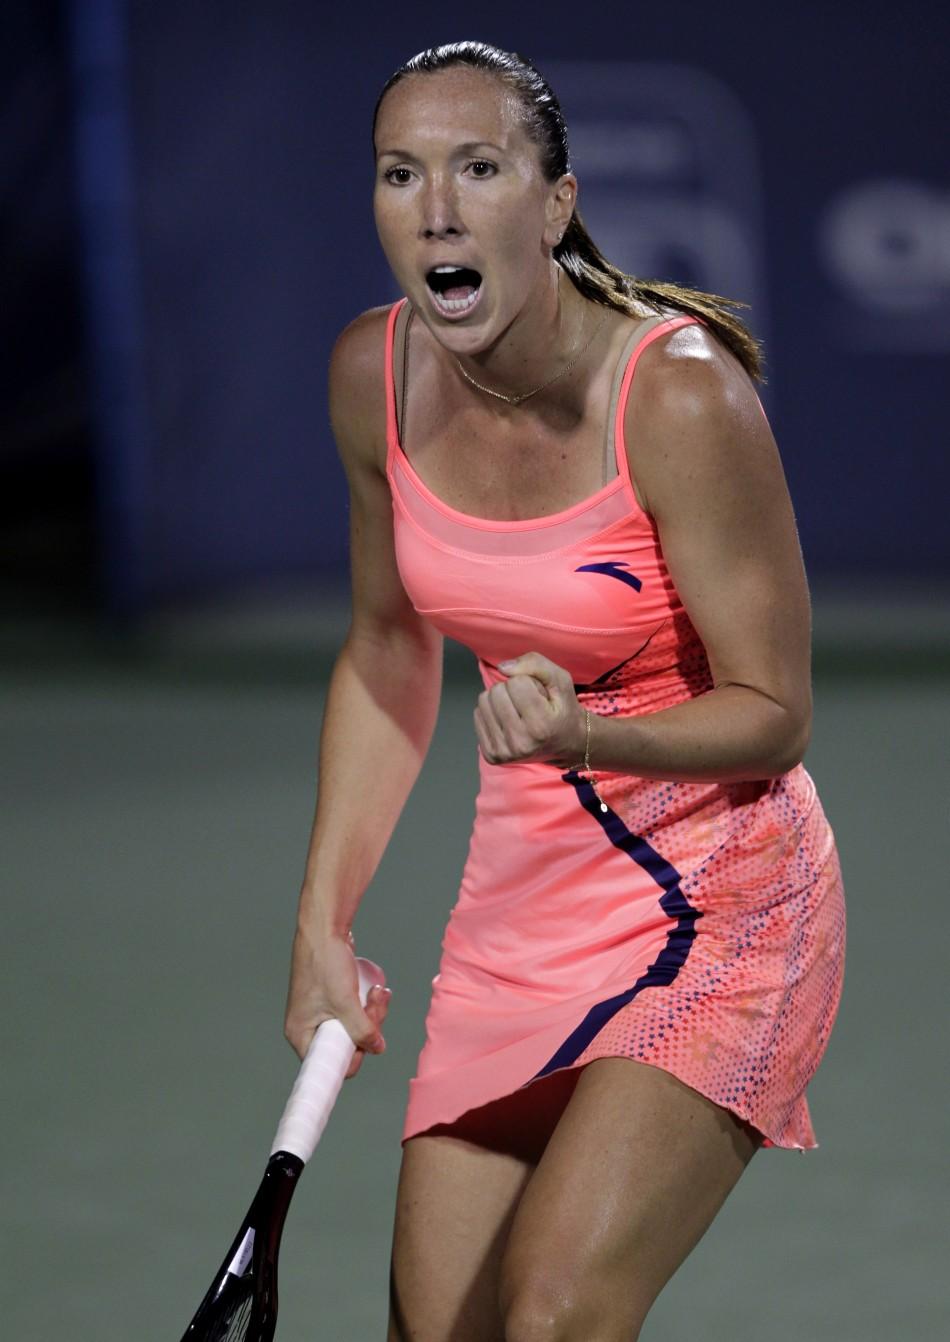 Jelena Jankovic Cameltoe Complete inside the baseline: august 2011